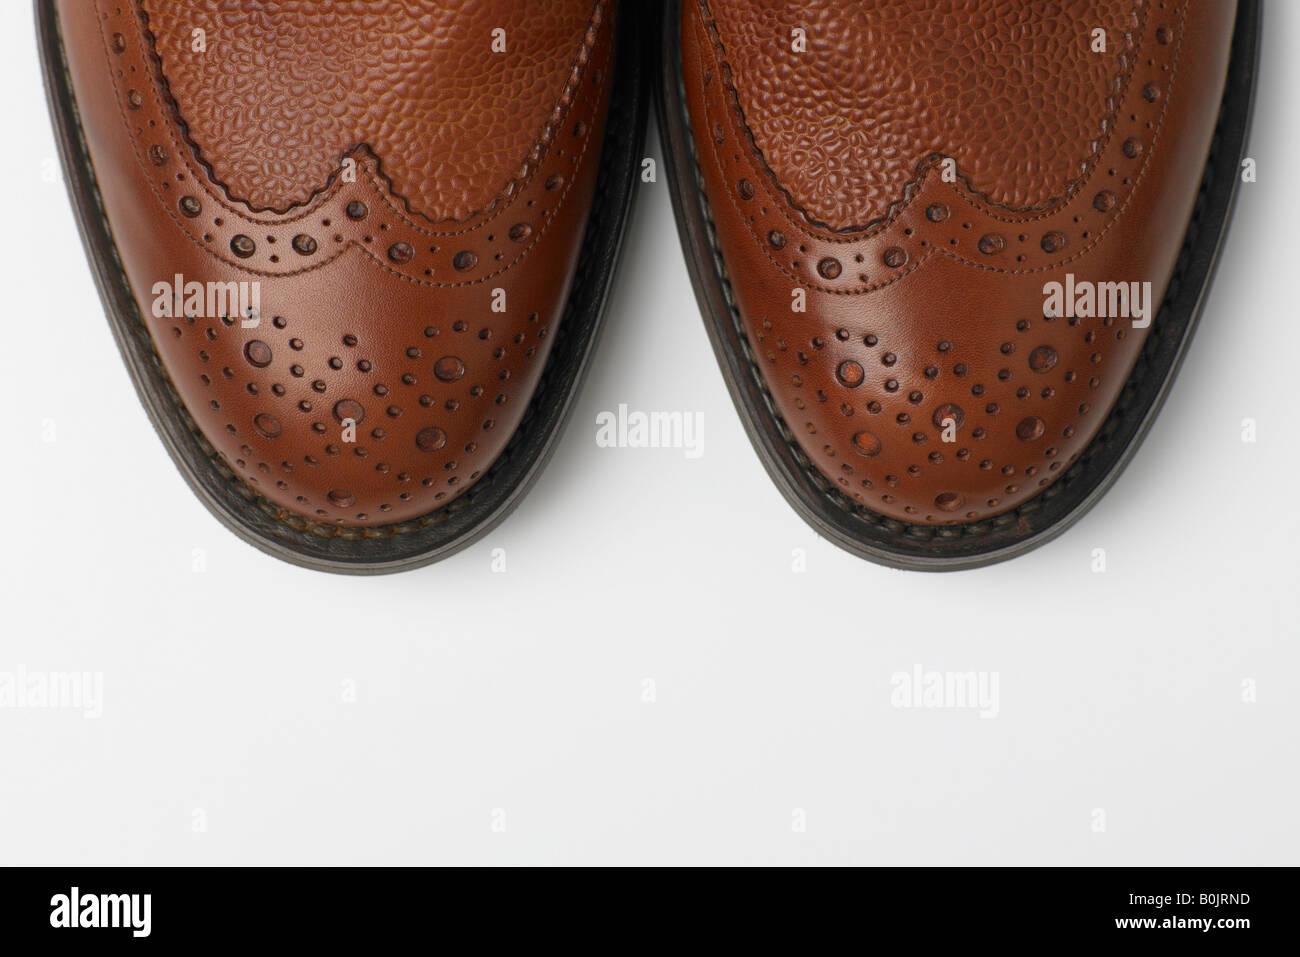 Trucs de brown chaussures brouge Photo Stock